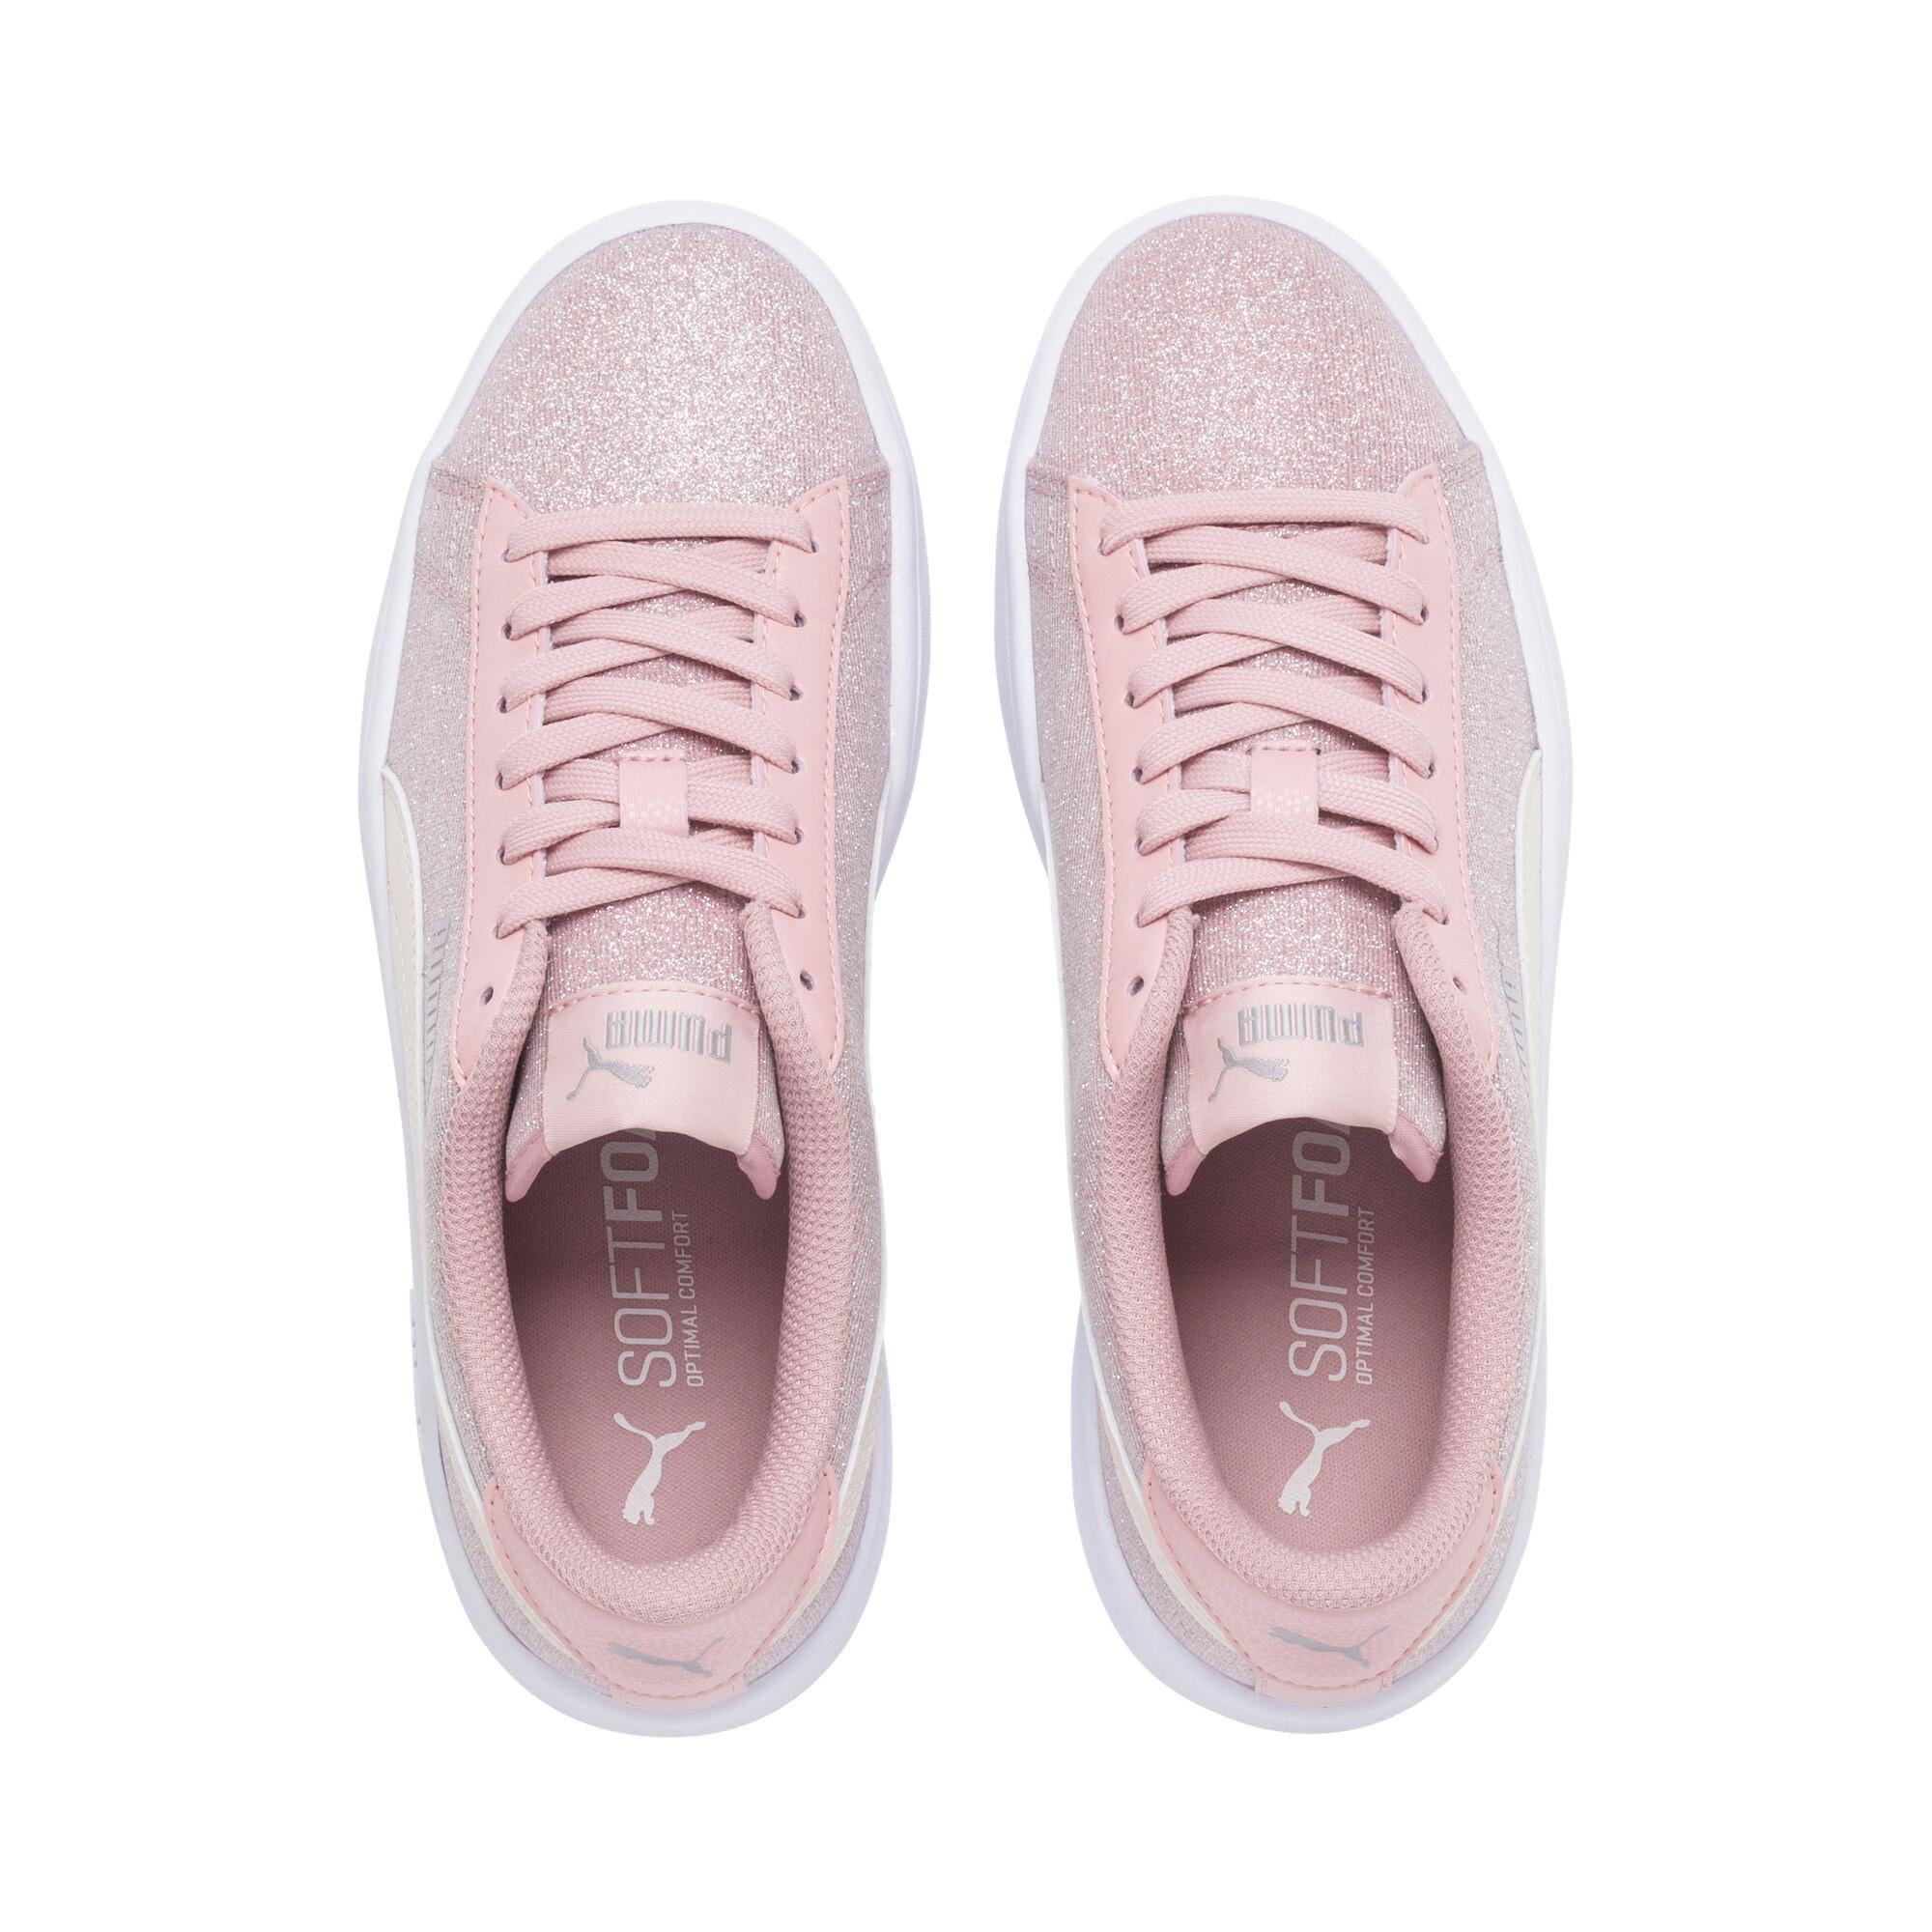 PUMA-Smash-v2-Glitz-Glam-Sneakers-JR-Girls-Shoe-Kids thumbnail 17